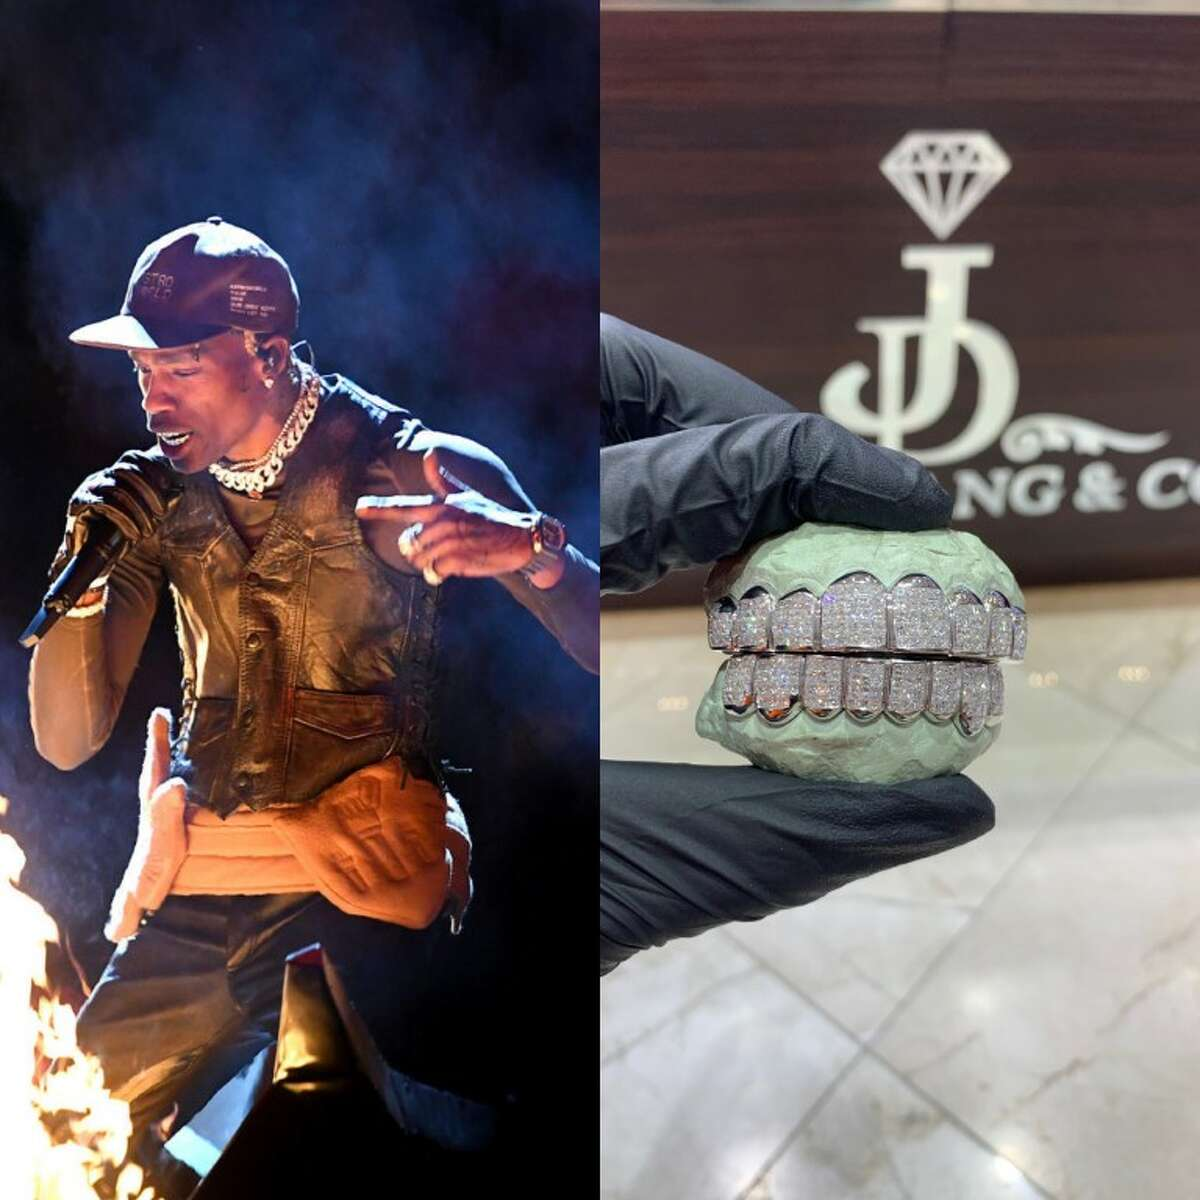 Houston rapper Travis Scott owns five grill sets by Dang.